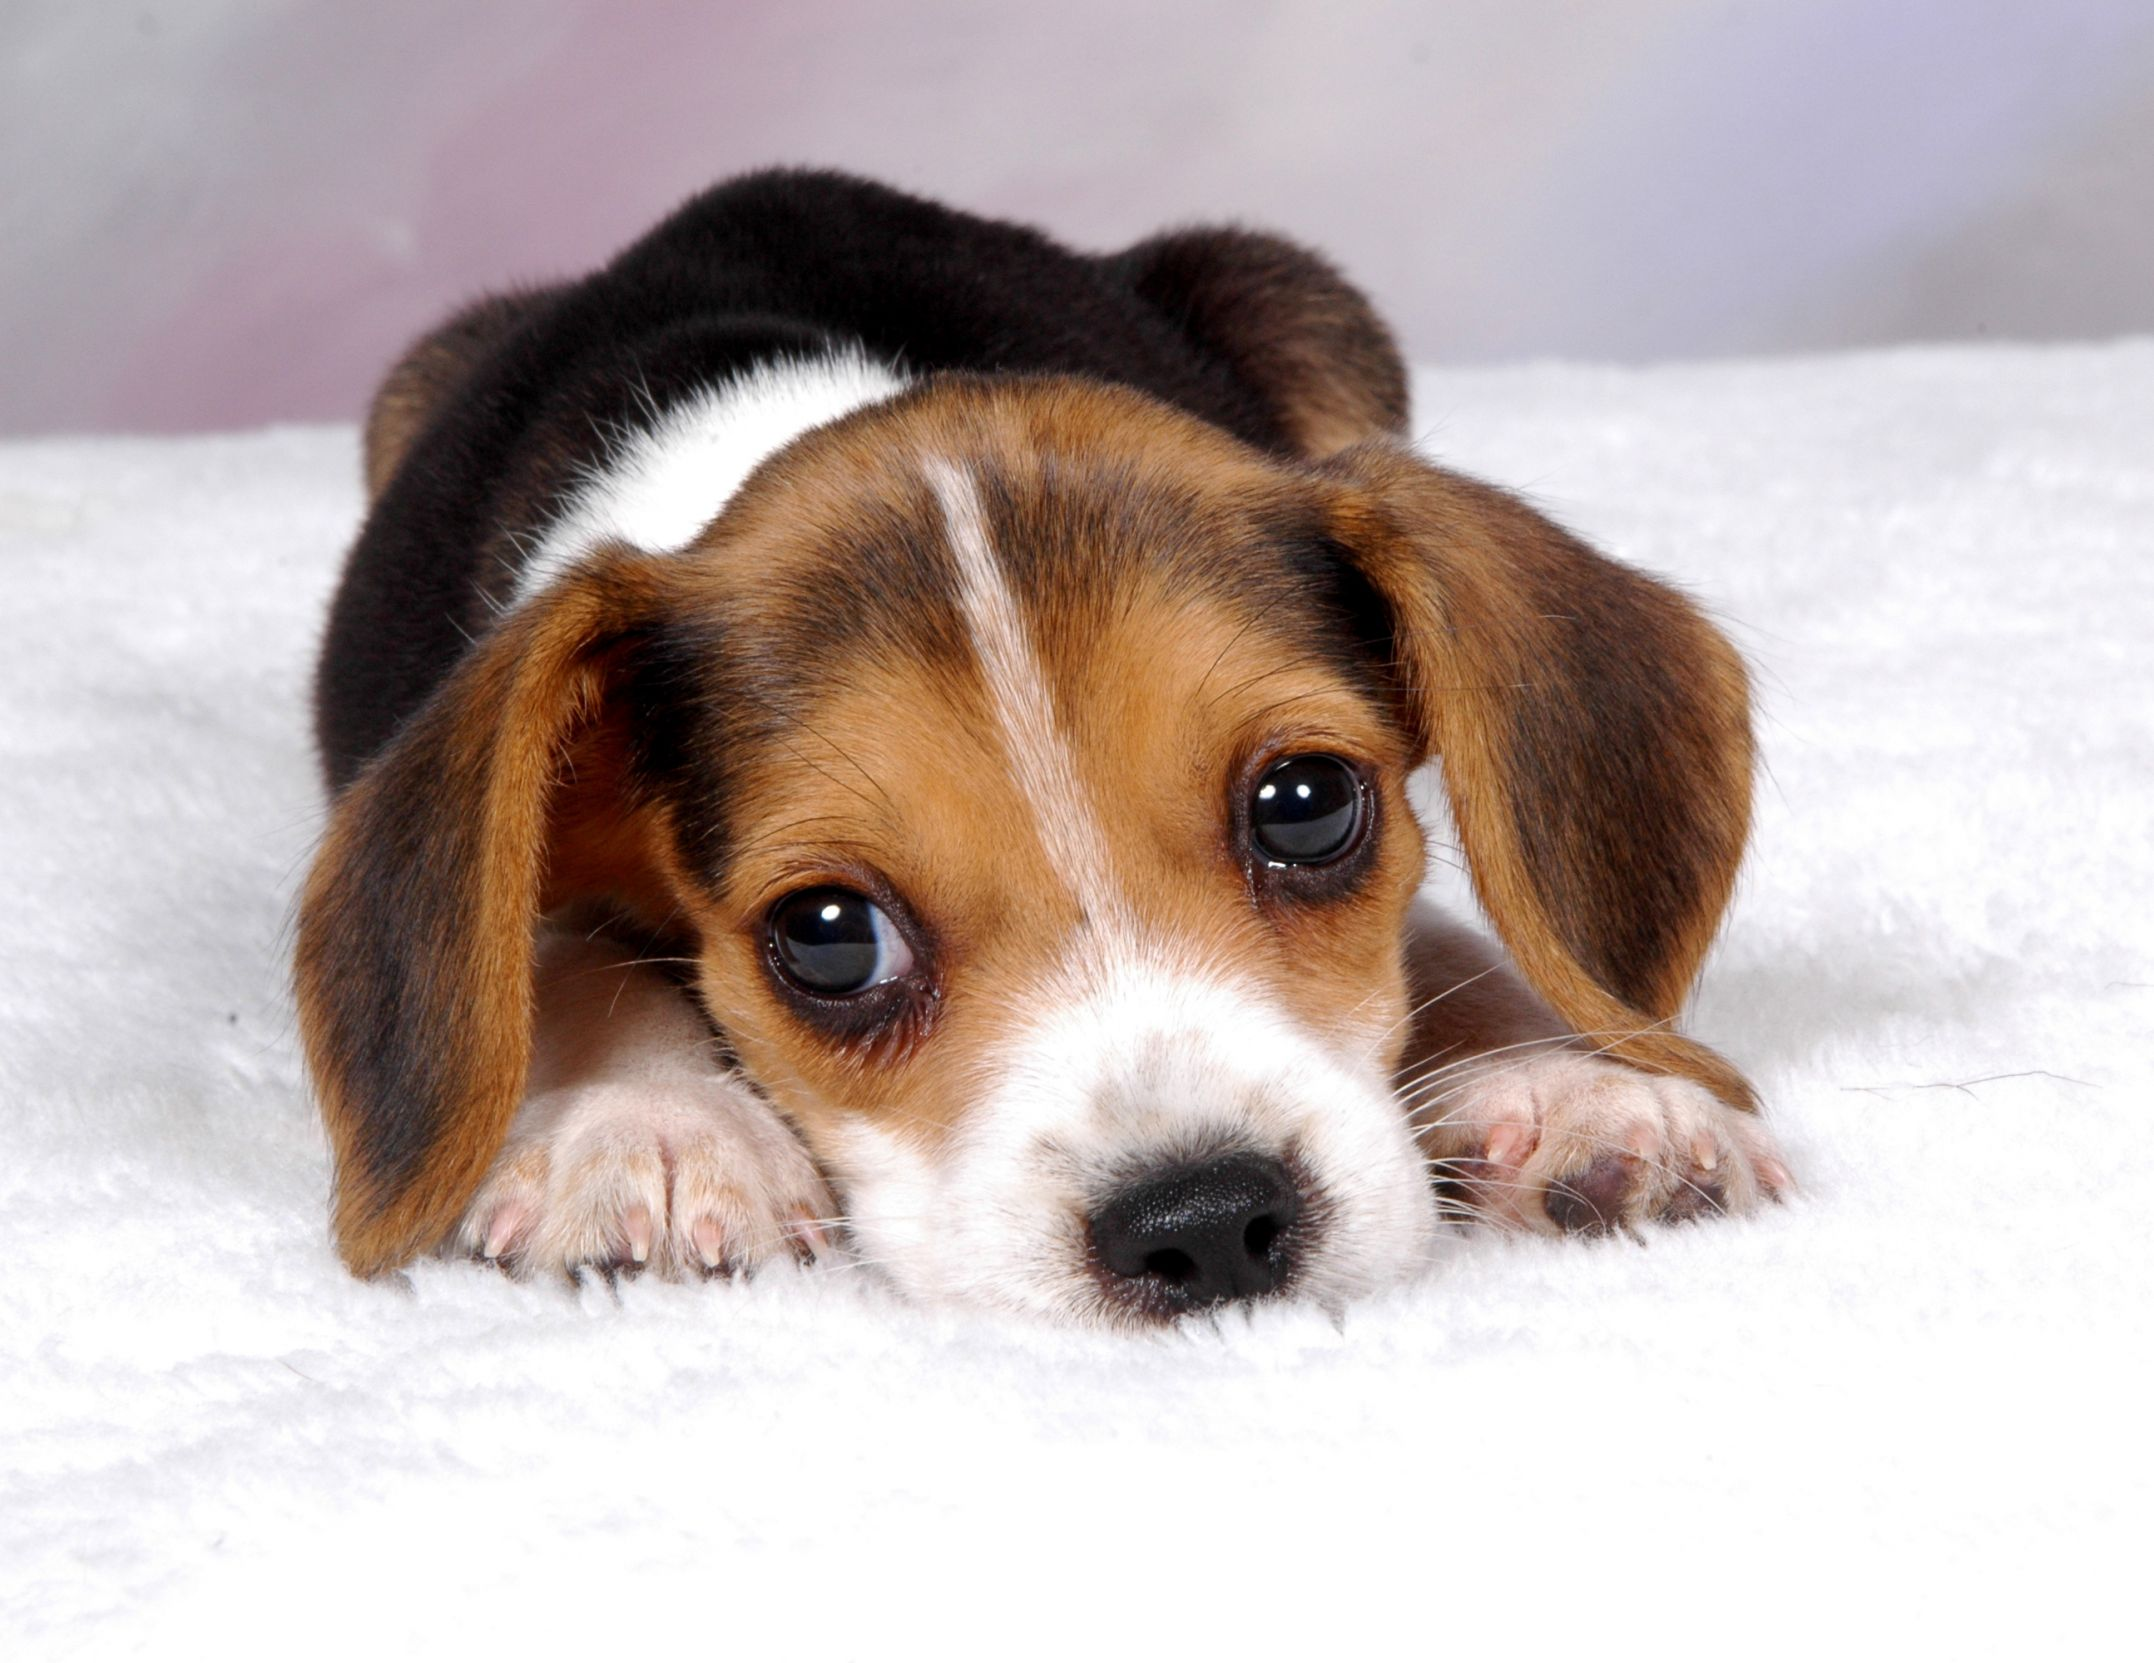 Sad puppy Blank Template - Imgflip